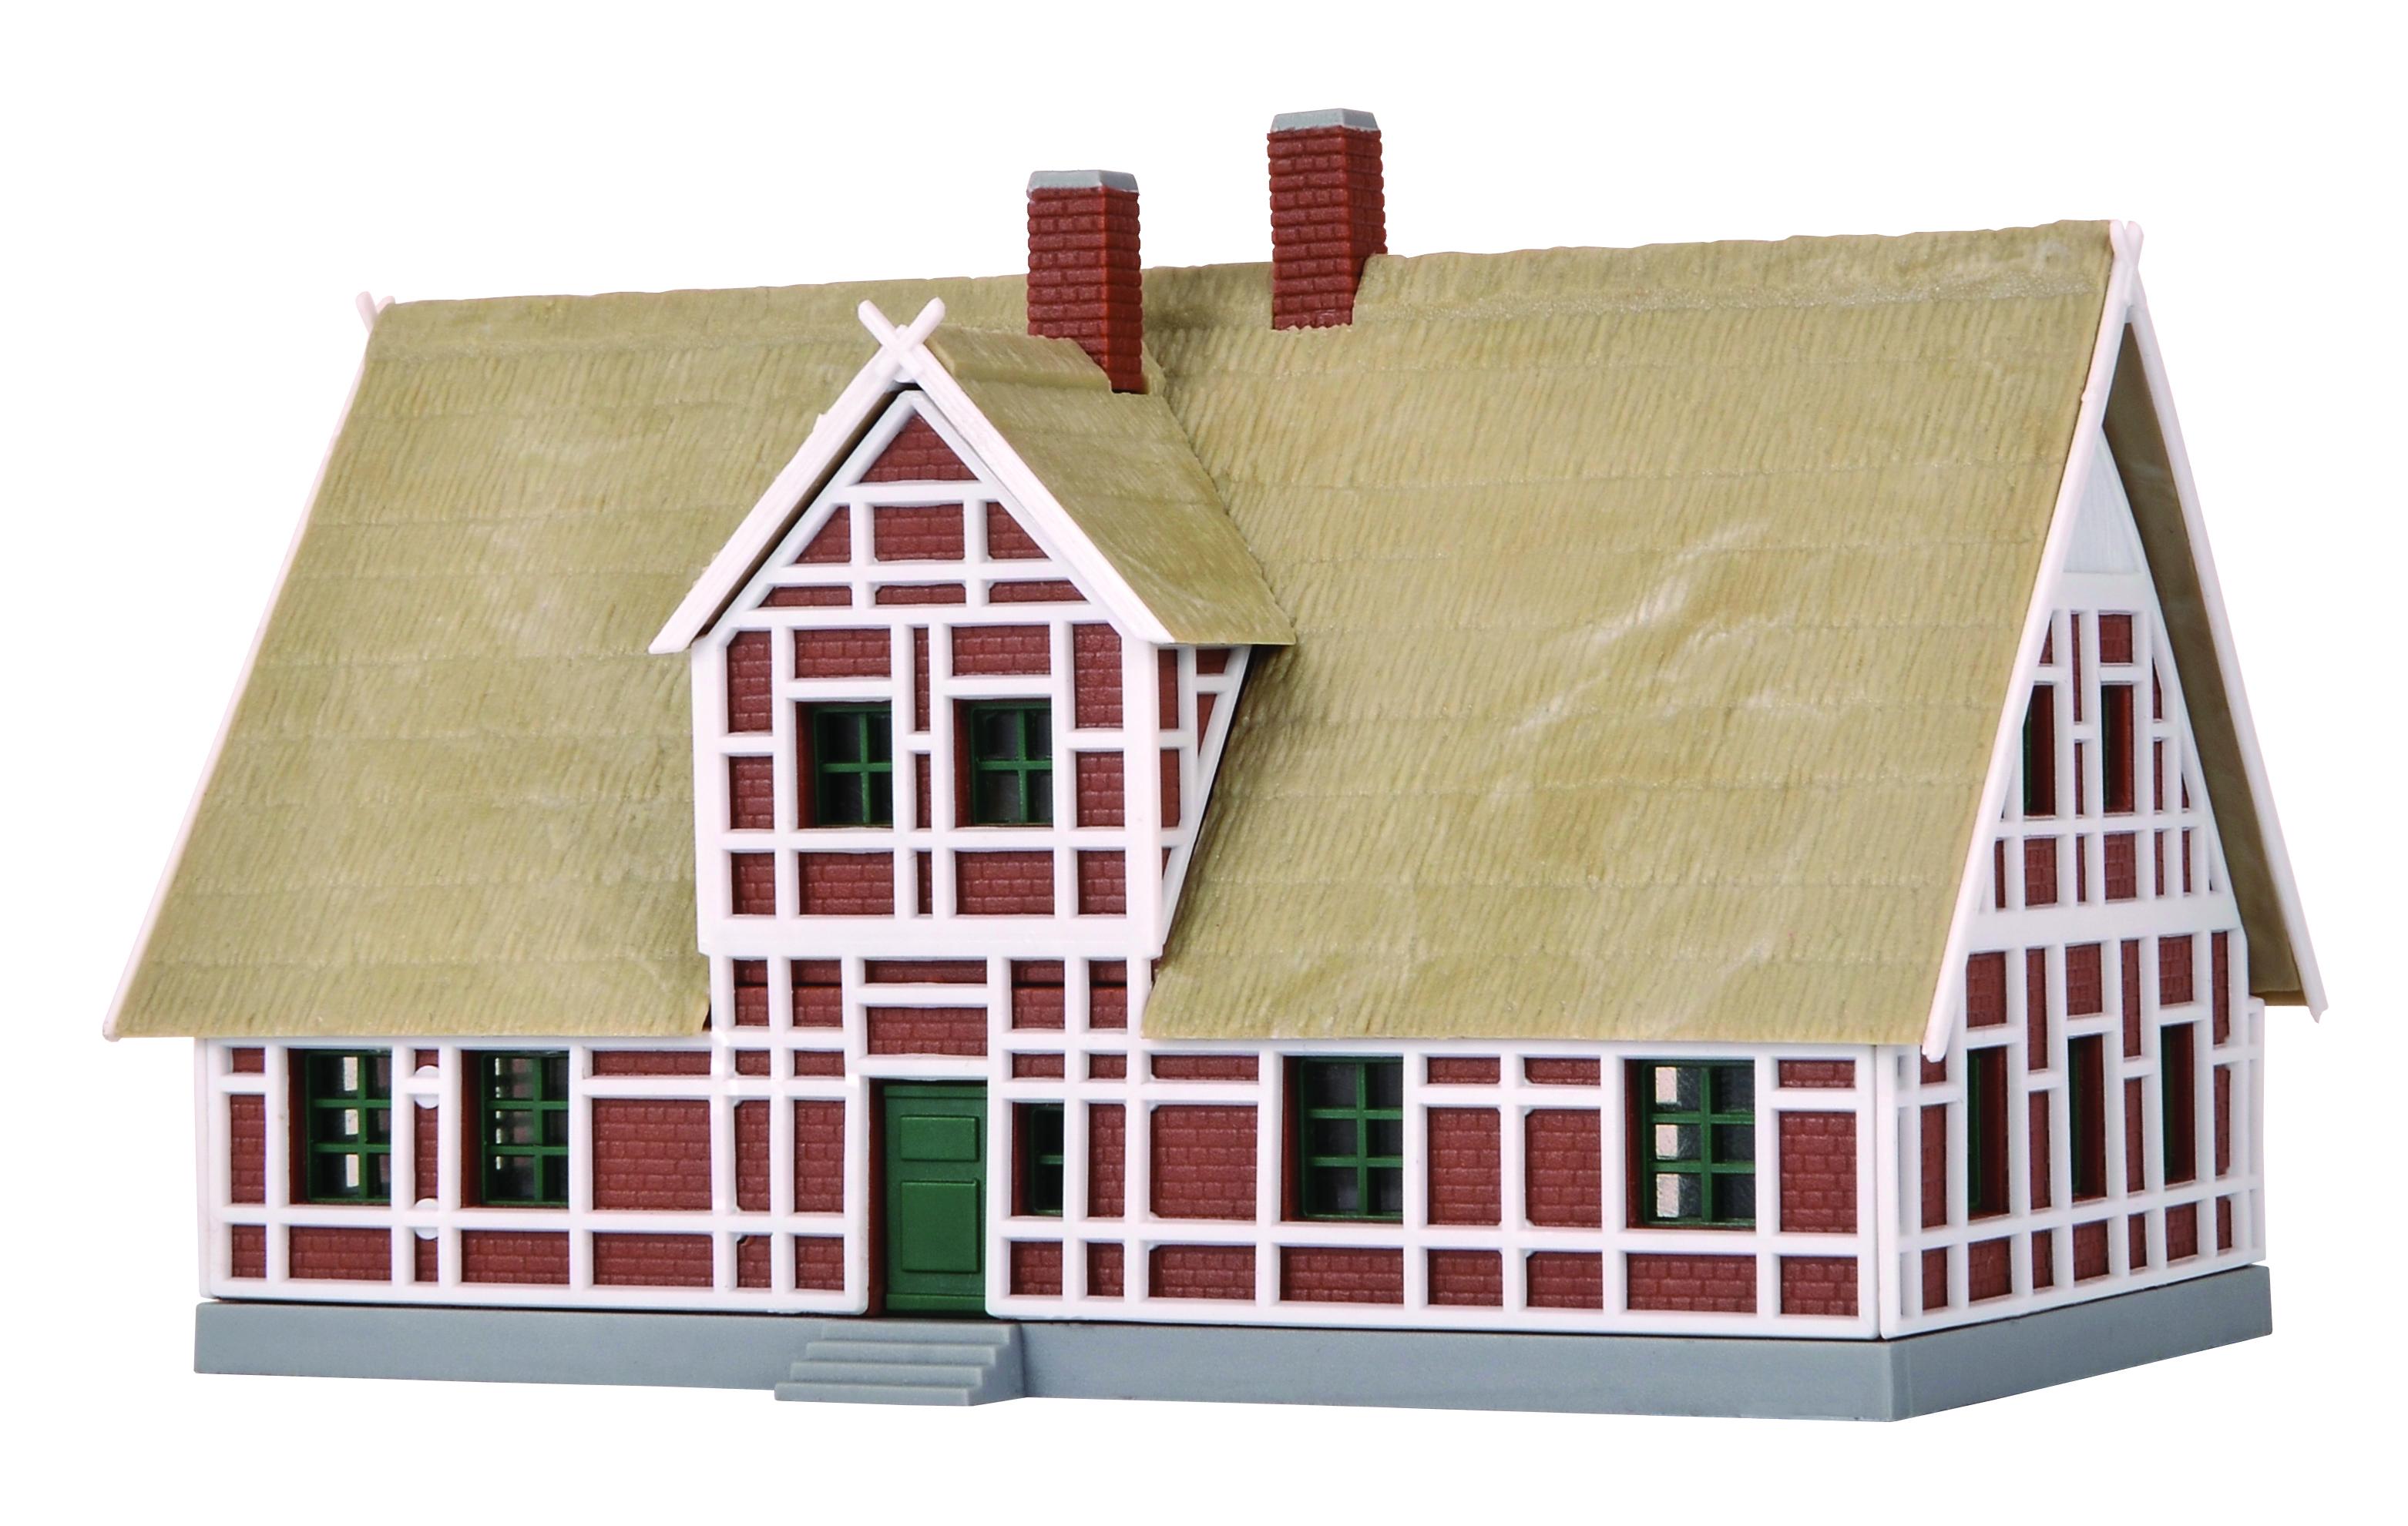 kibri 37318 <br/>Reetdachhaus